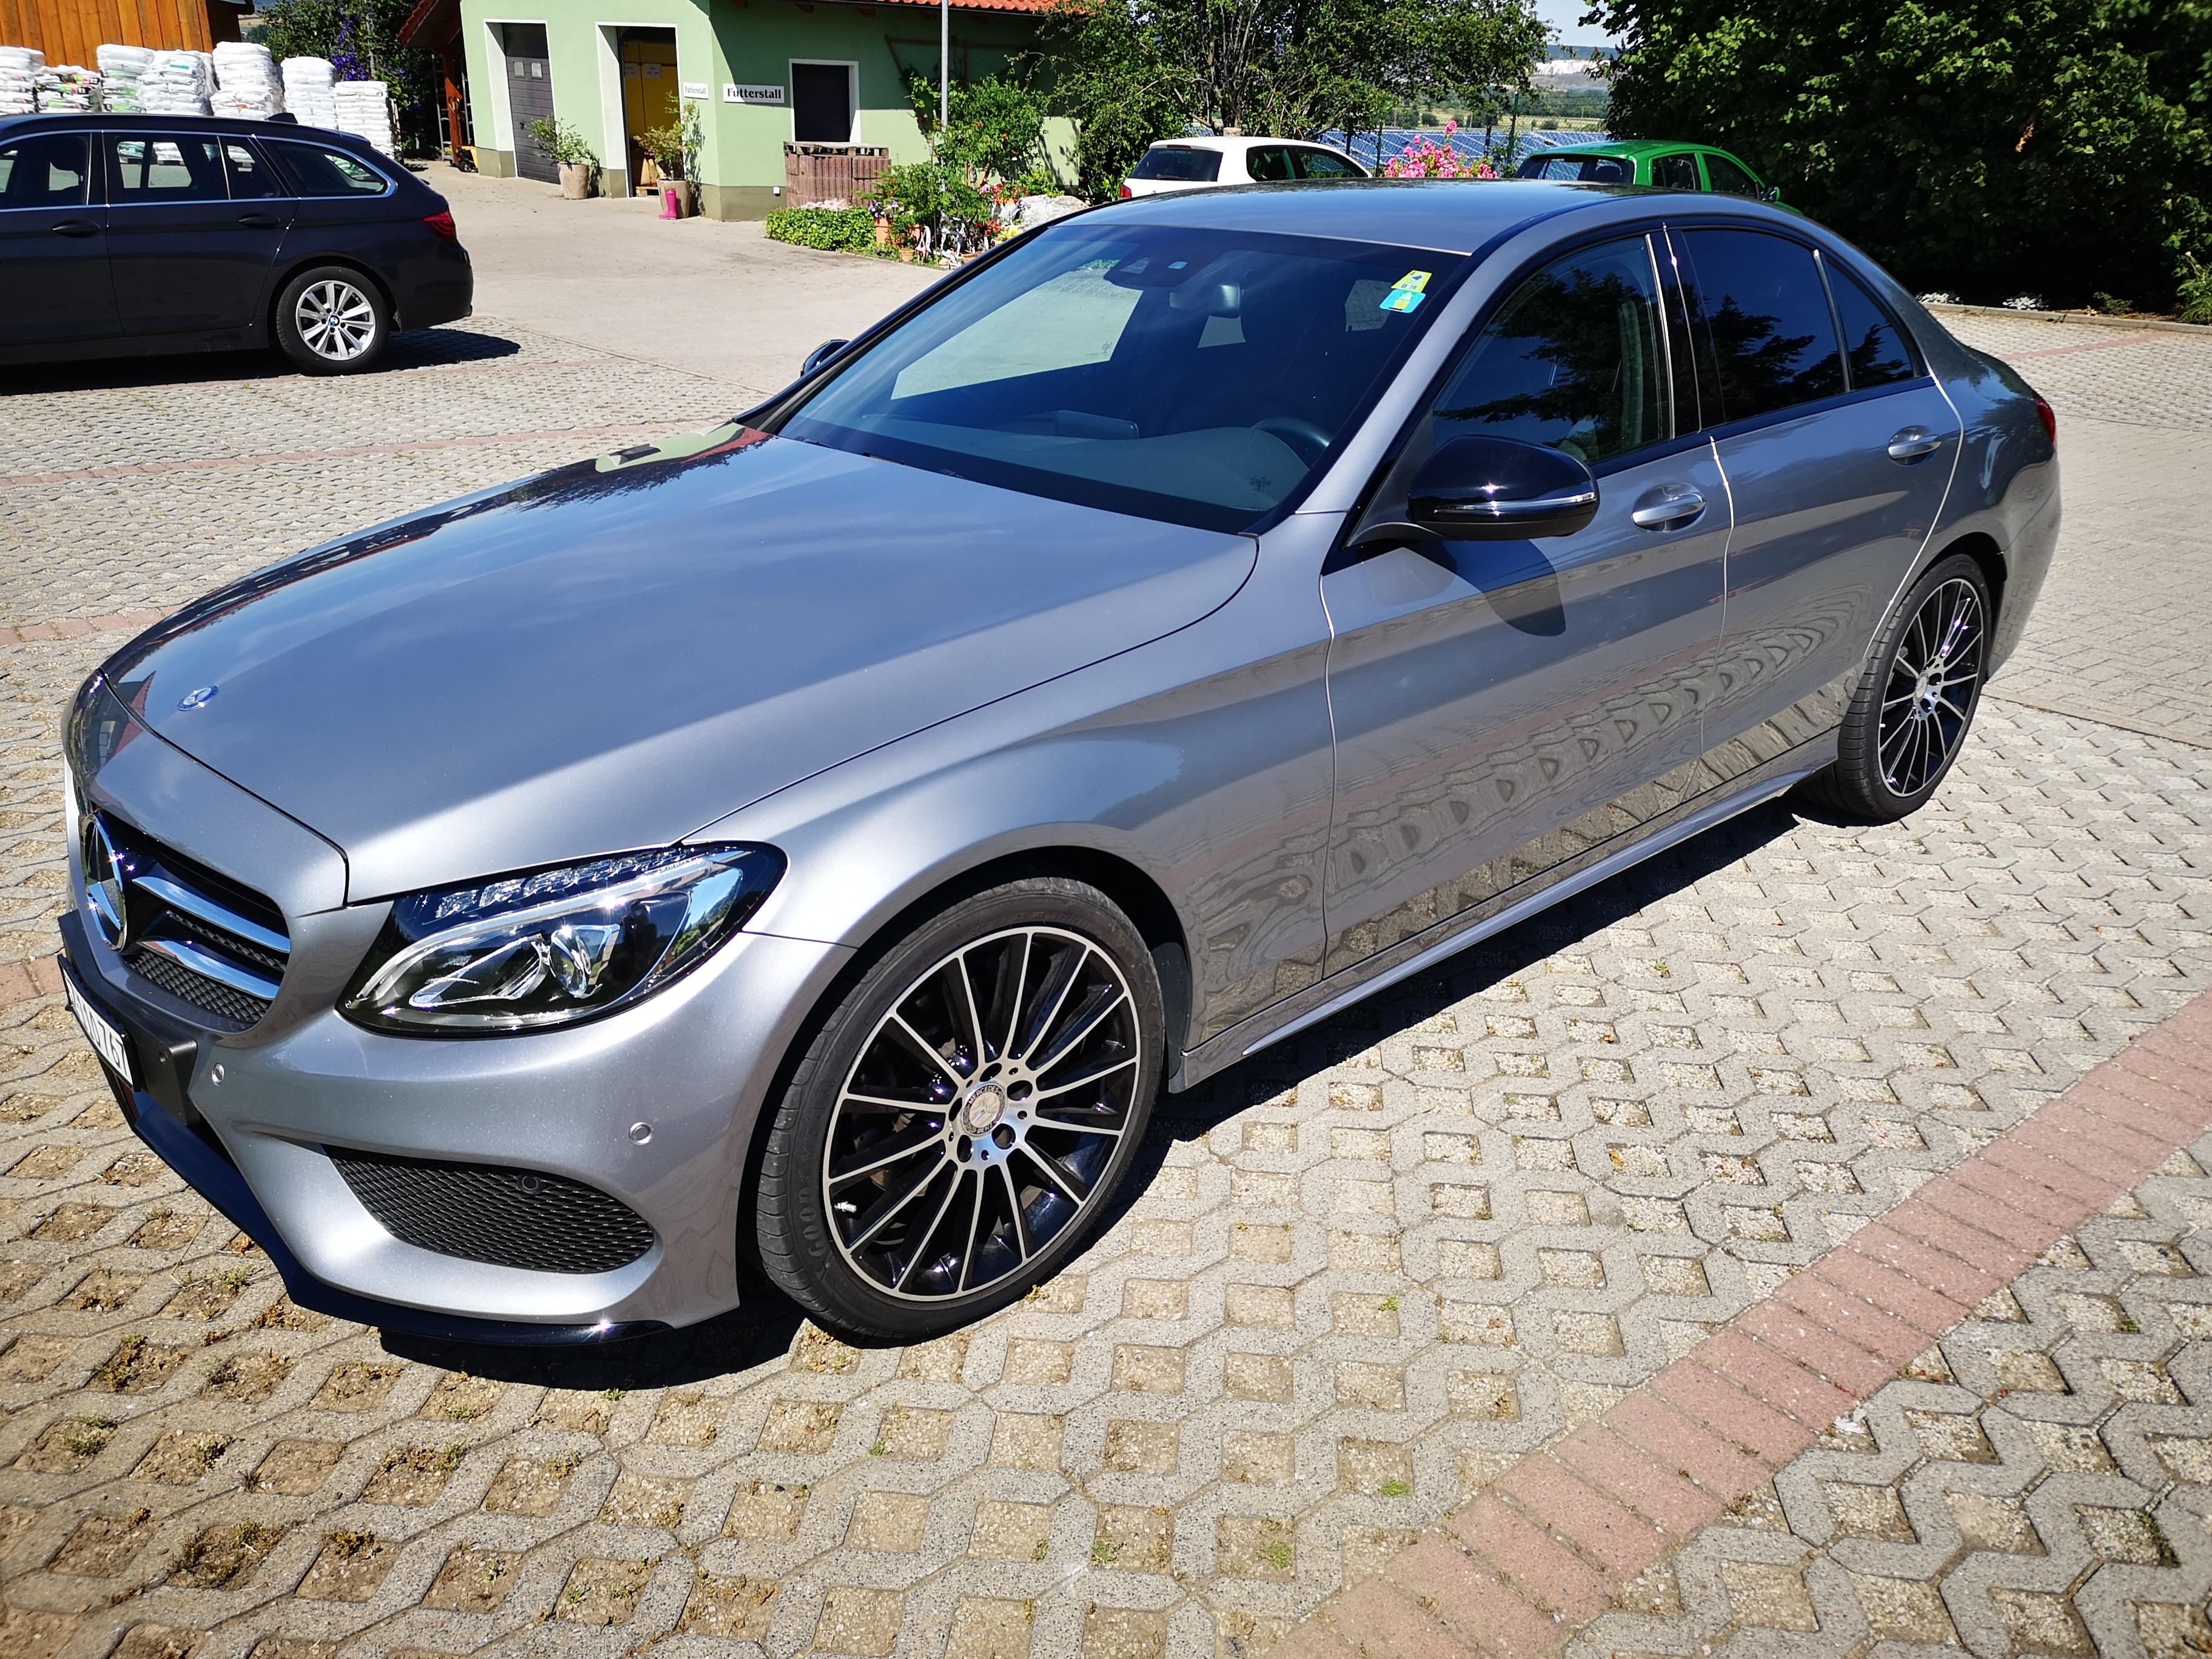 Gebraucht Limousine Mercedes-Benz C-Klasse C 220 d AMG ...